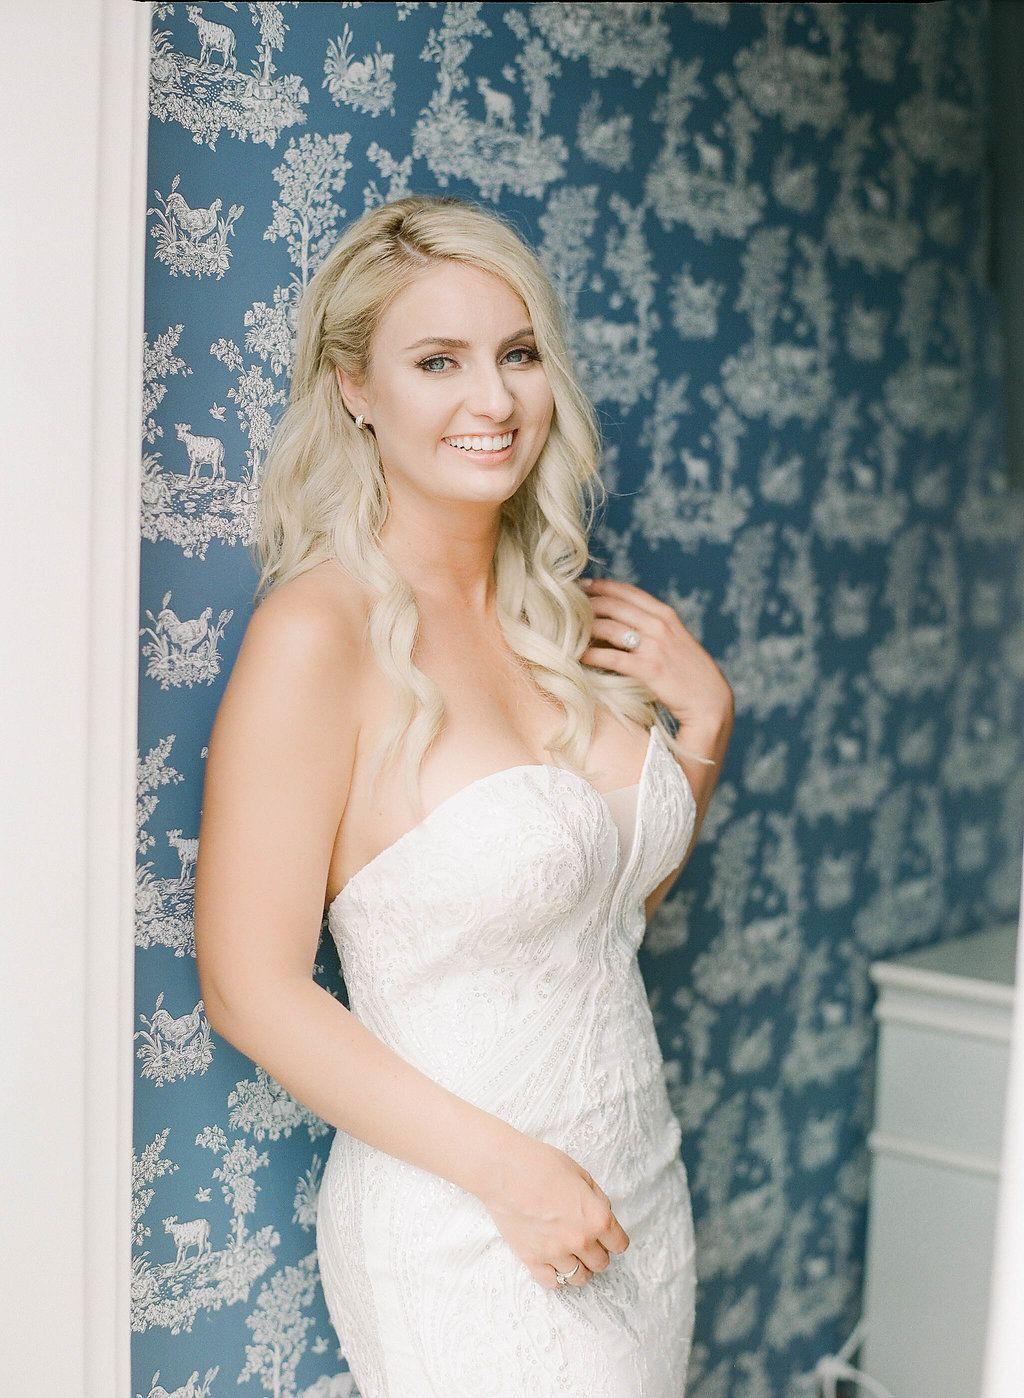 Strapless Wedding Dress Lace Wedding Dress Blonde Bride Loose Waves